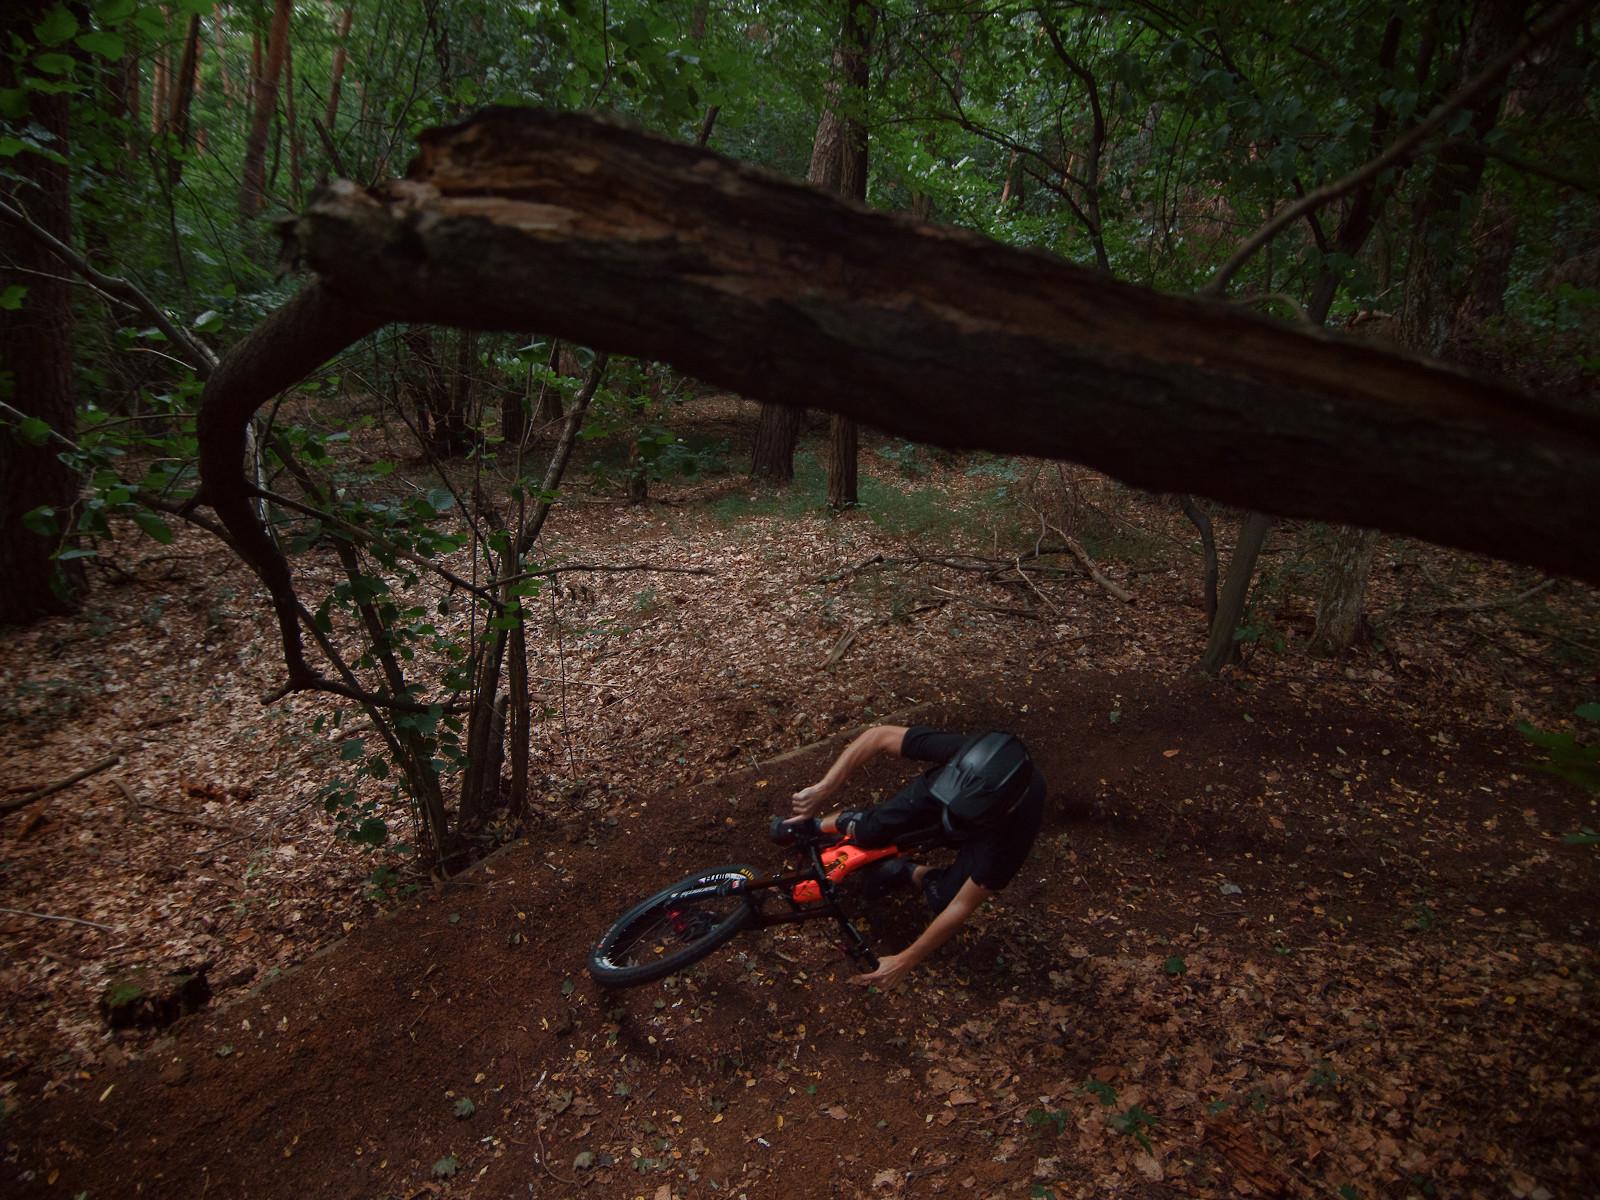 Under the tree - EWIA - Mountain Biking Pictures - Vital MTB